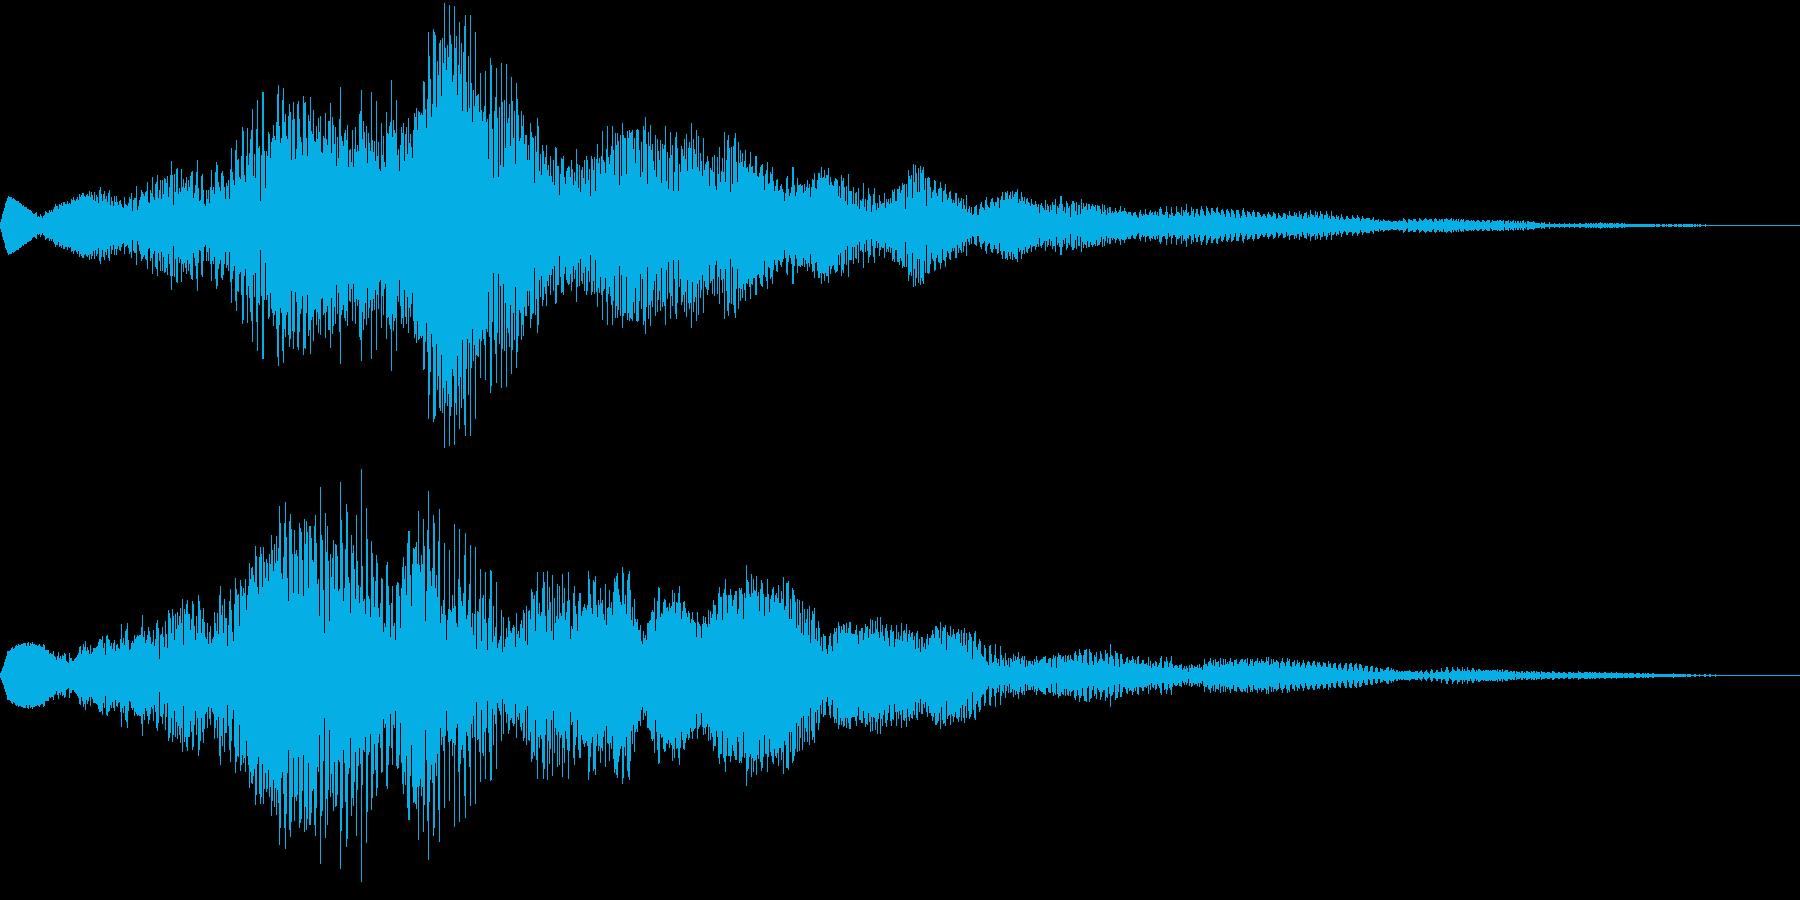 Pad 前兆・予兆・不吉・不安 SEの再生済みの波形